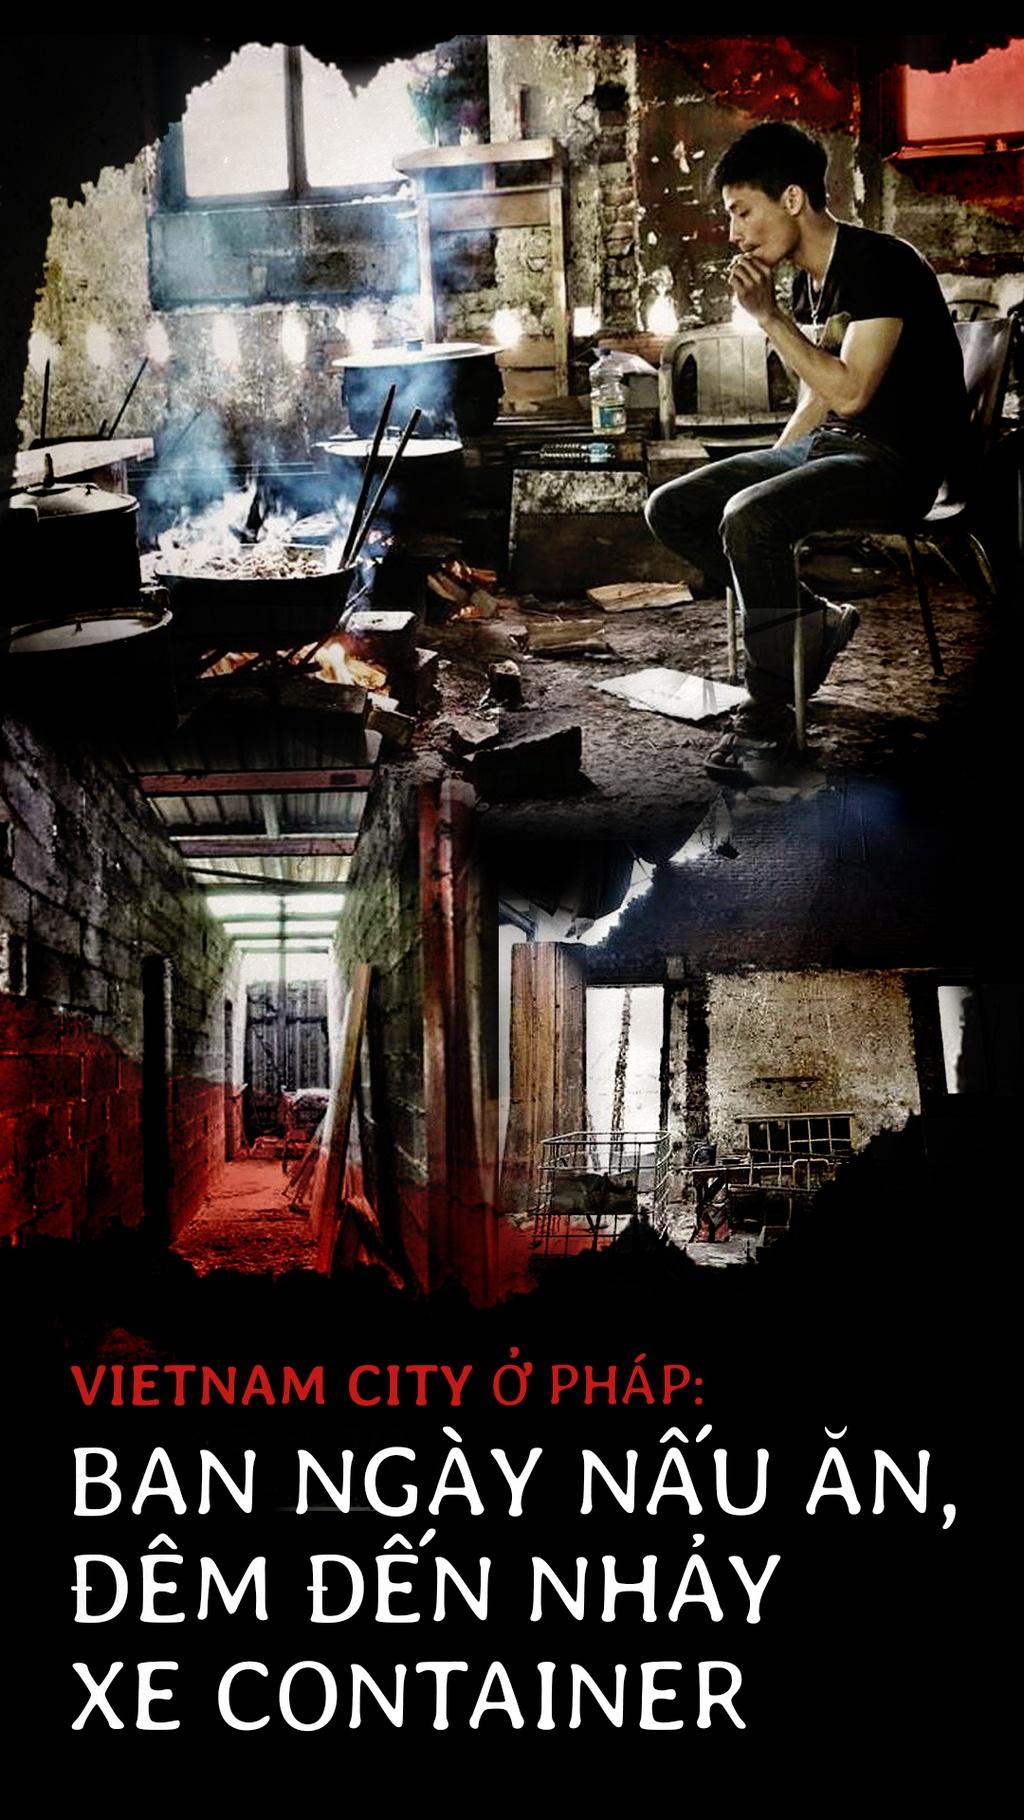 Vietnam City o Phap: Ban ngay nau an, dem den nhay xe container hinh anh 1